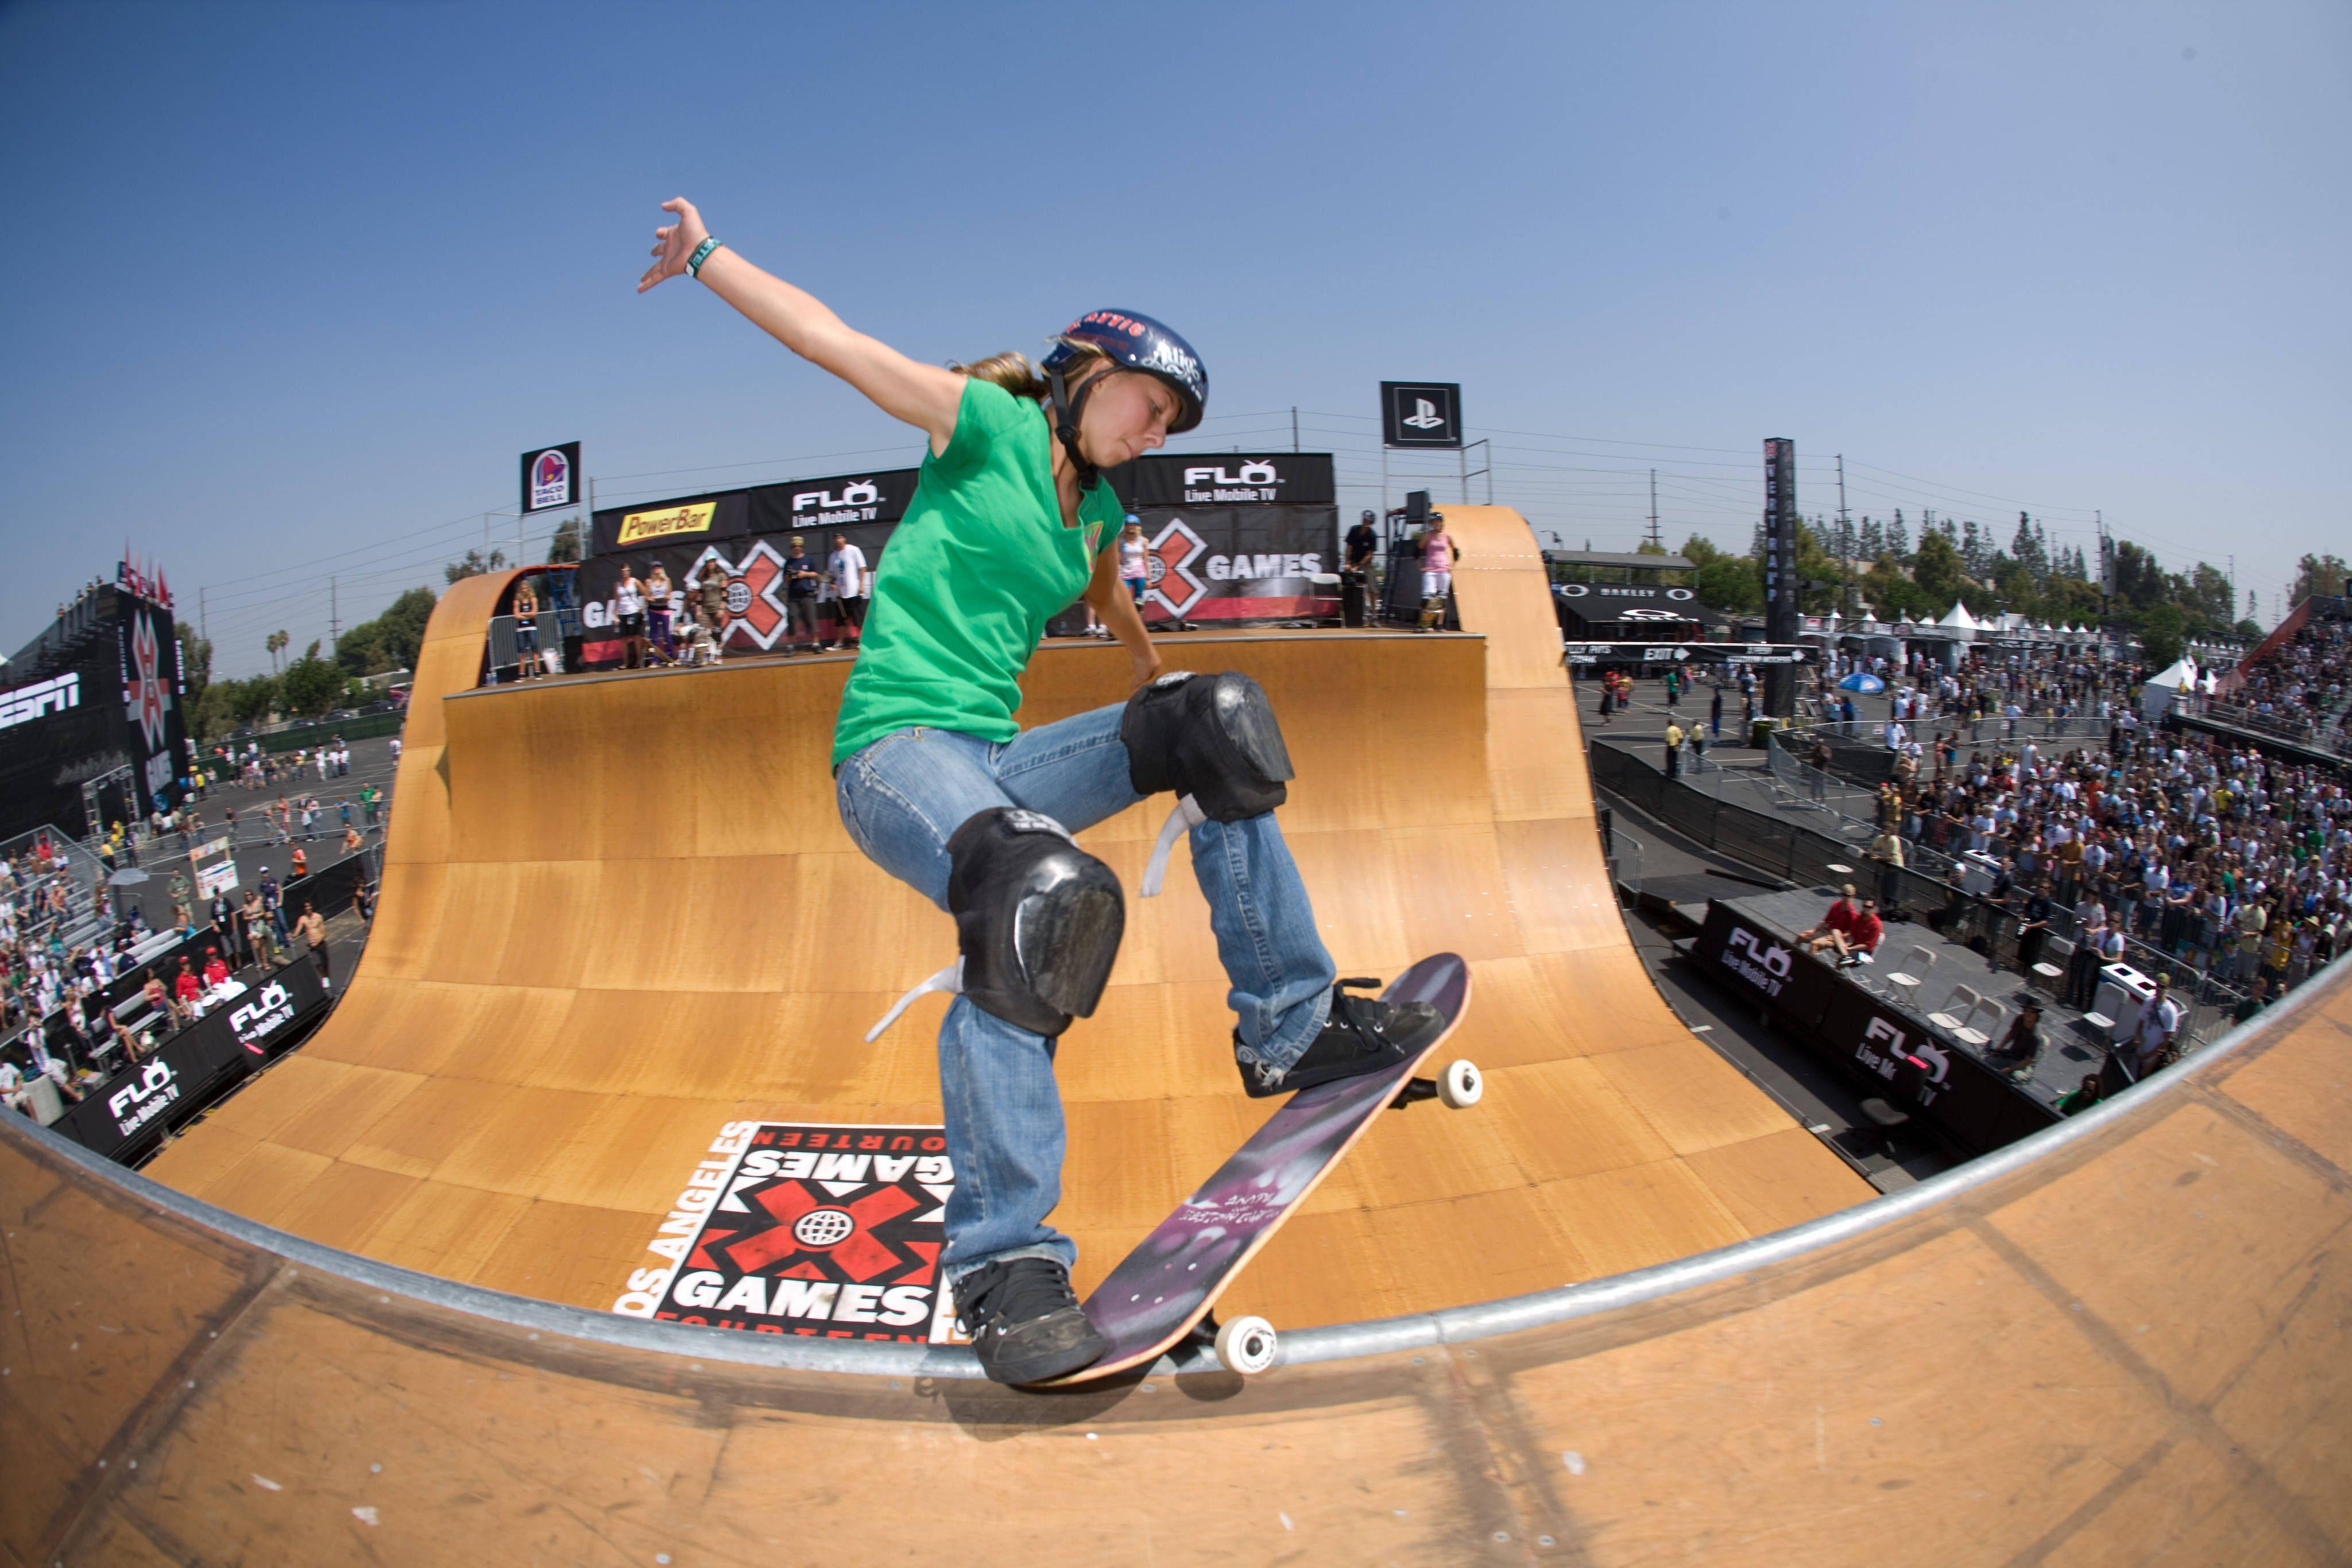 Roller skating x games - X Games Skateboarding Photo Gallery